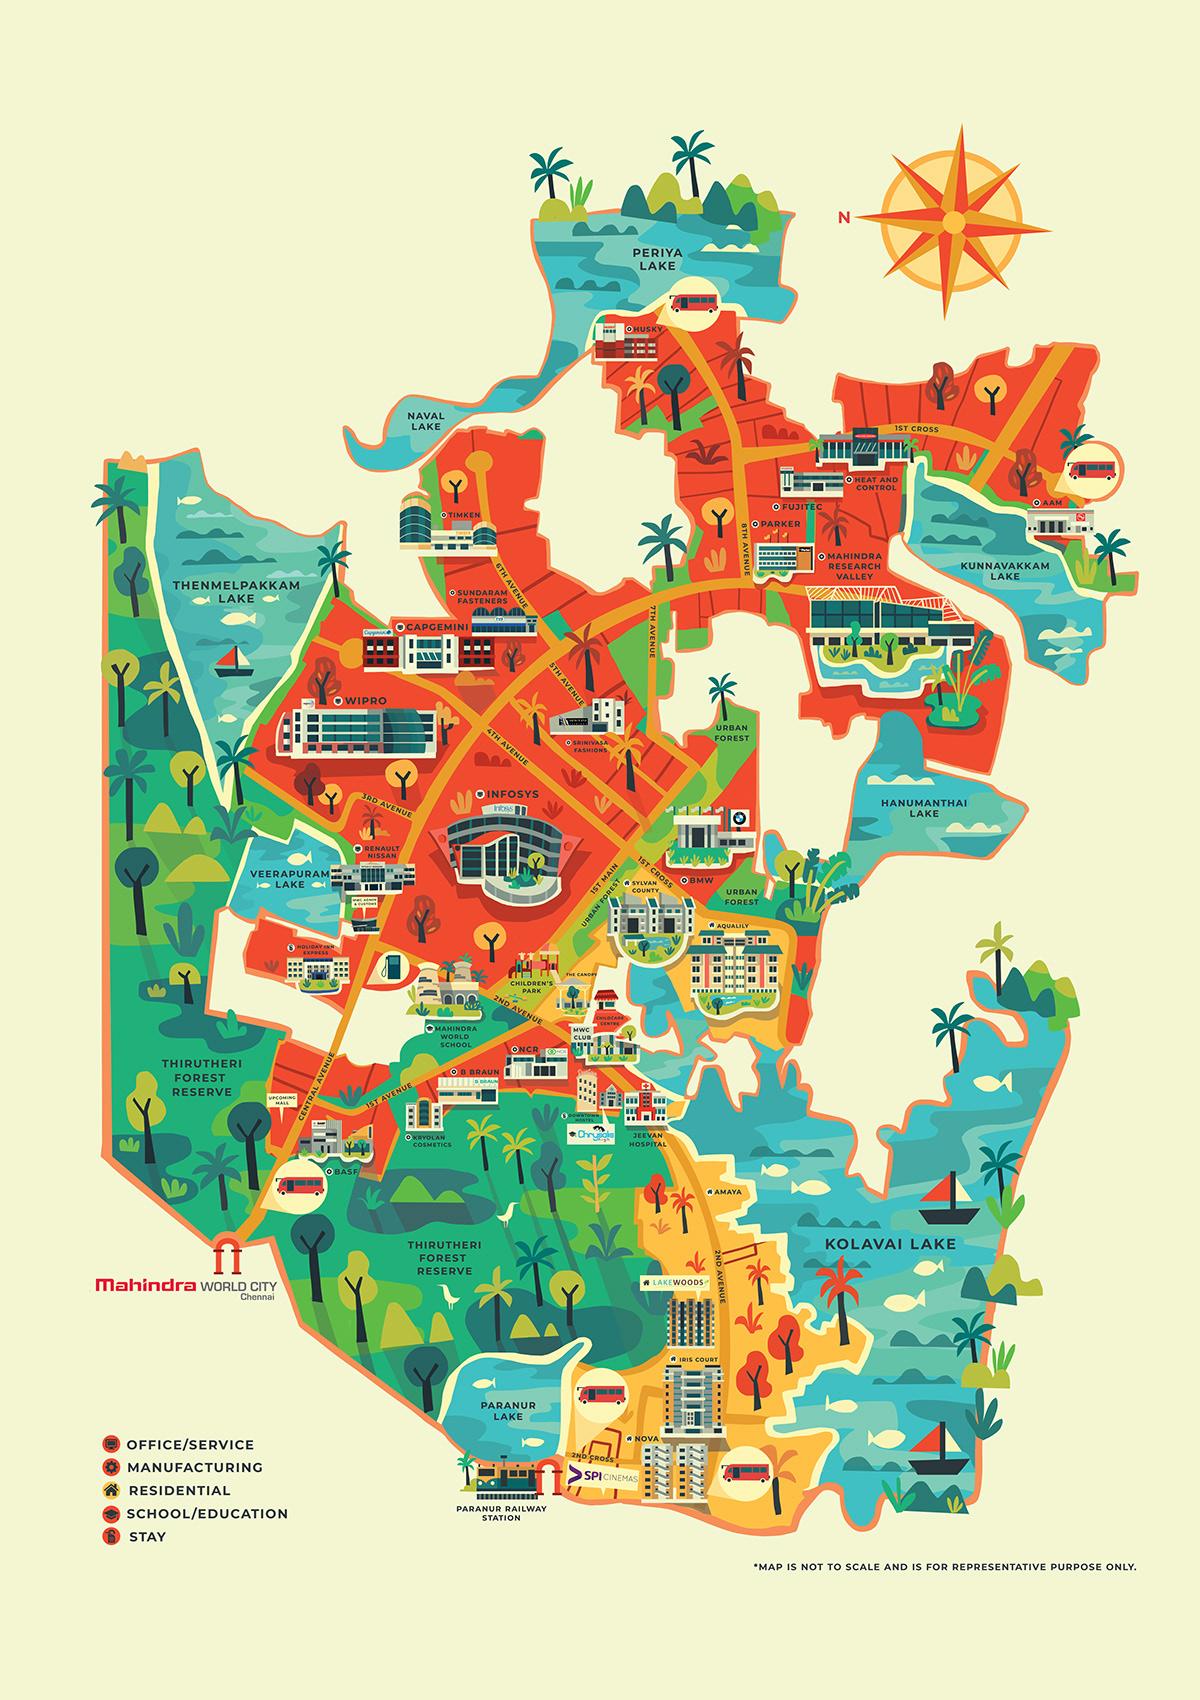 Mahindra world city map illustration on scad portfolios pins details map details gumiabroncs Images